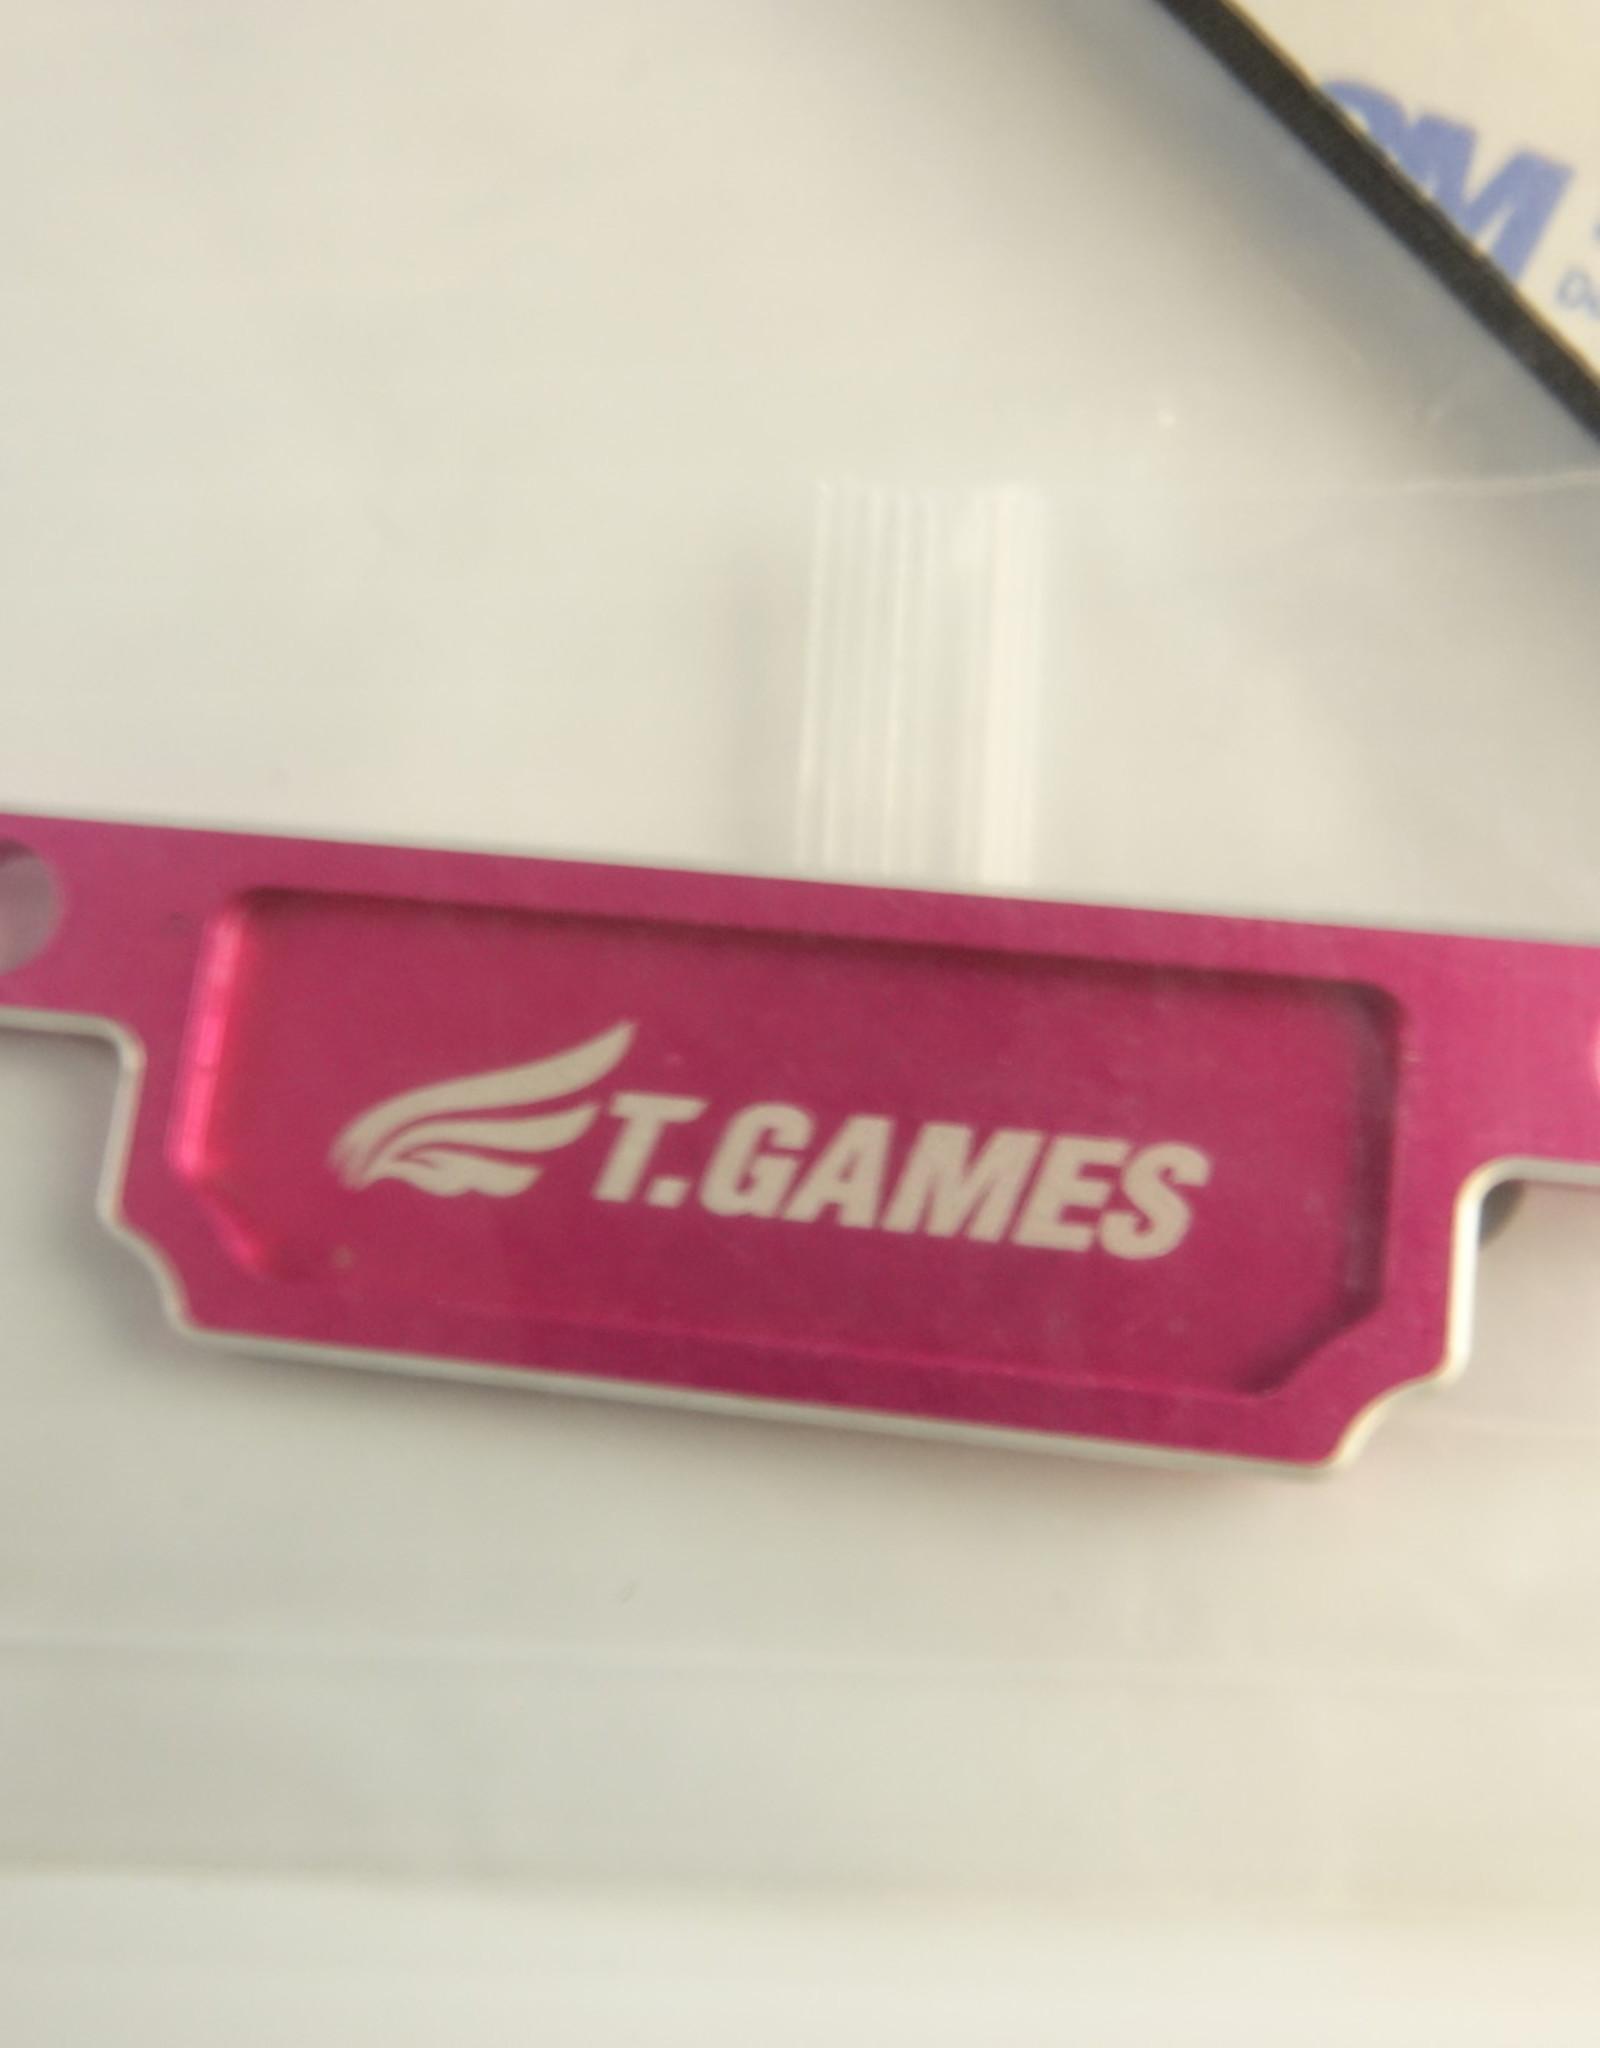 OmG OMGTG-YX05-NT Metal Body Catch System (Pink) - RCOMG TG-YX05-NT